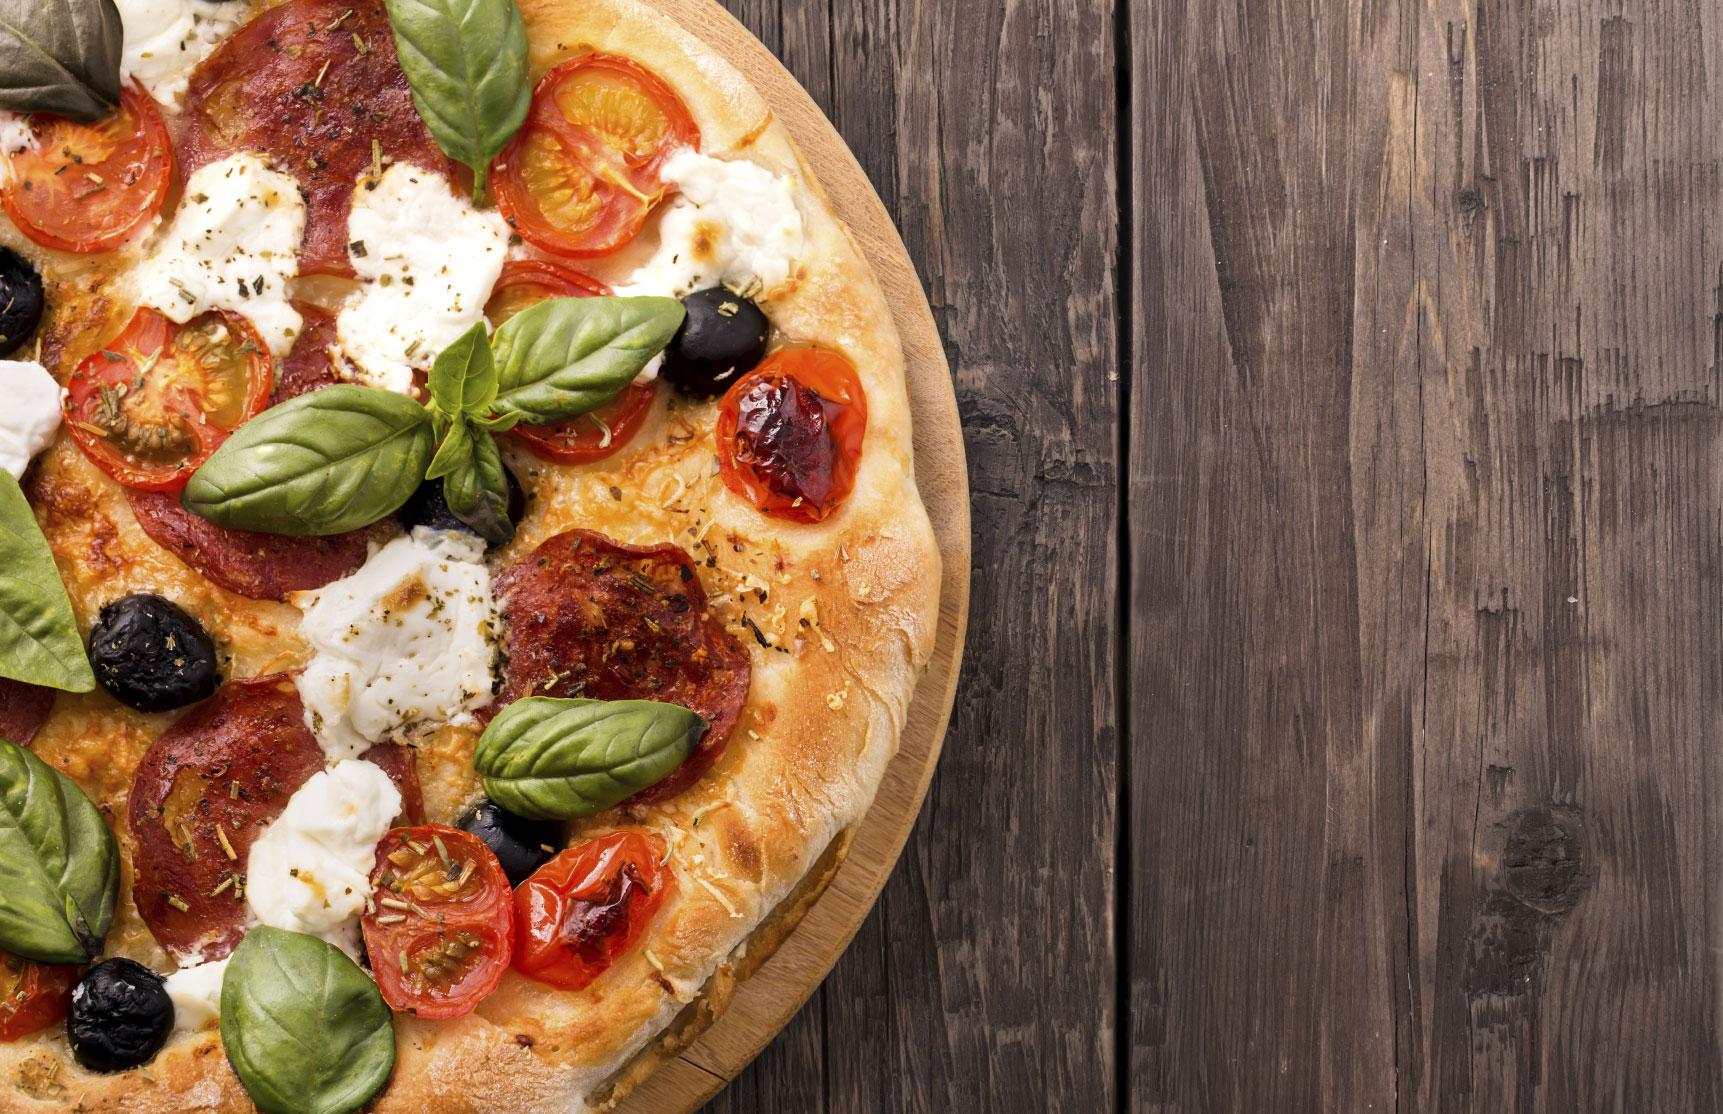 Bwm Dentsu Creates Surprise Pizza Experiences For Celebs